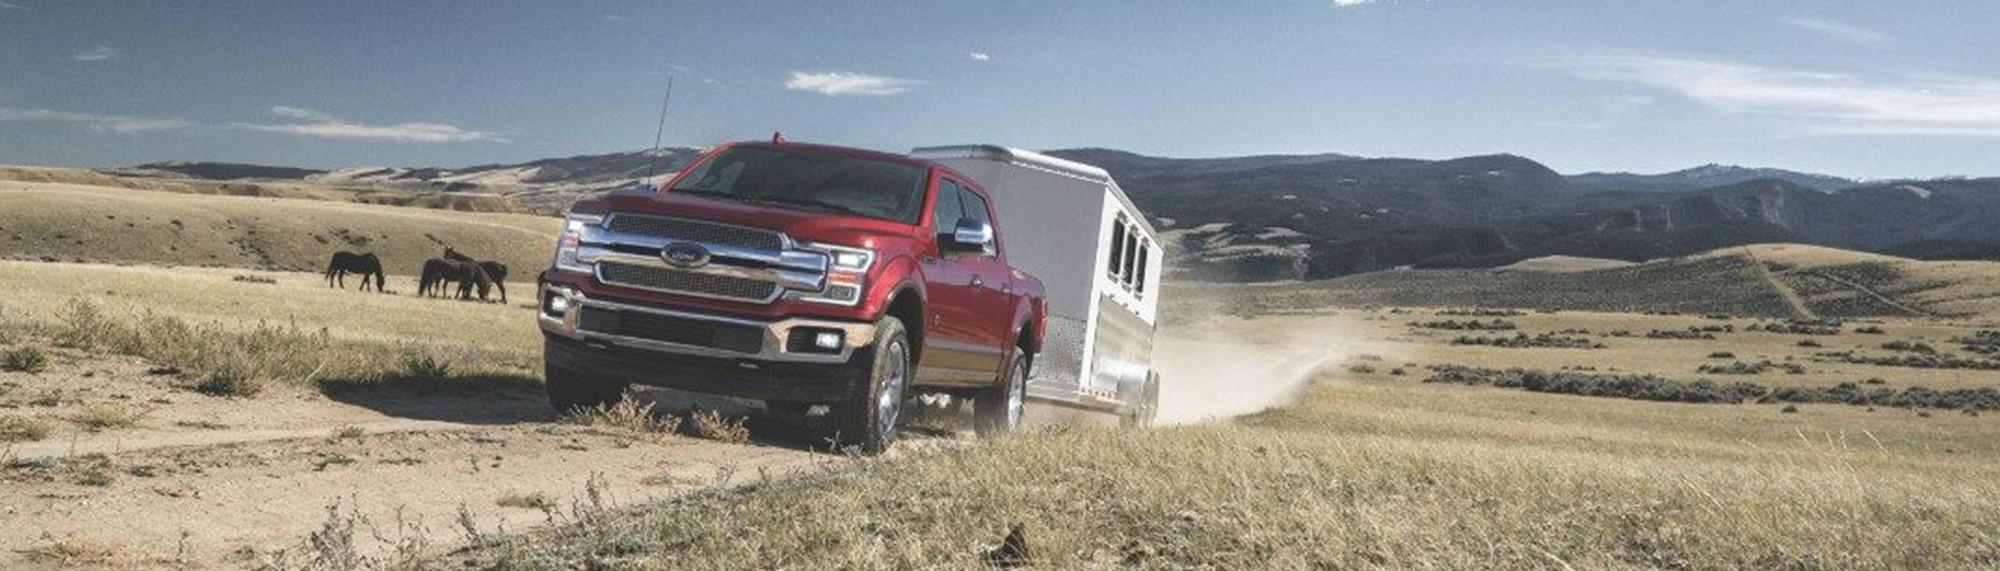 2018 Ford F 150 Diesel In Wiscasset 350 Fuel Filter Location